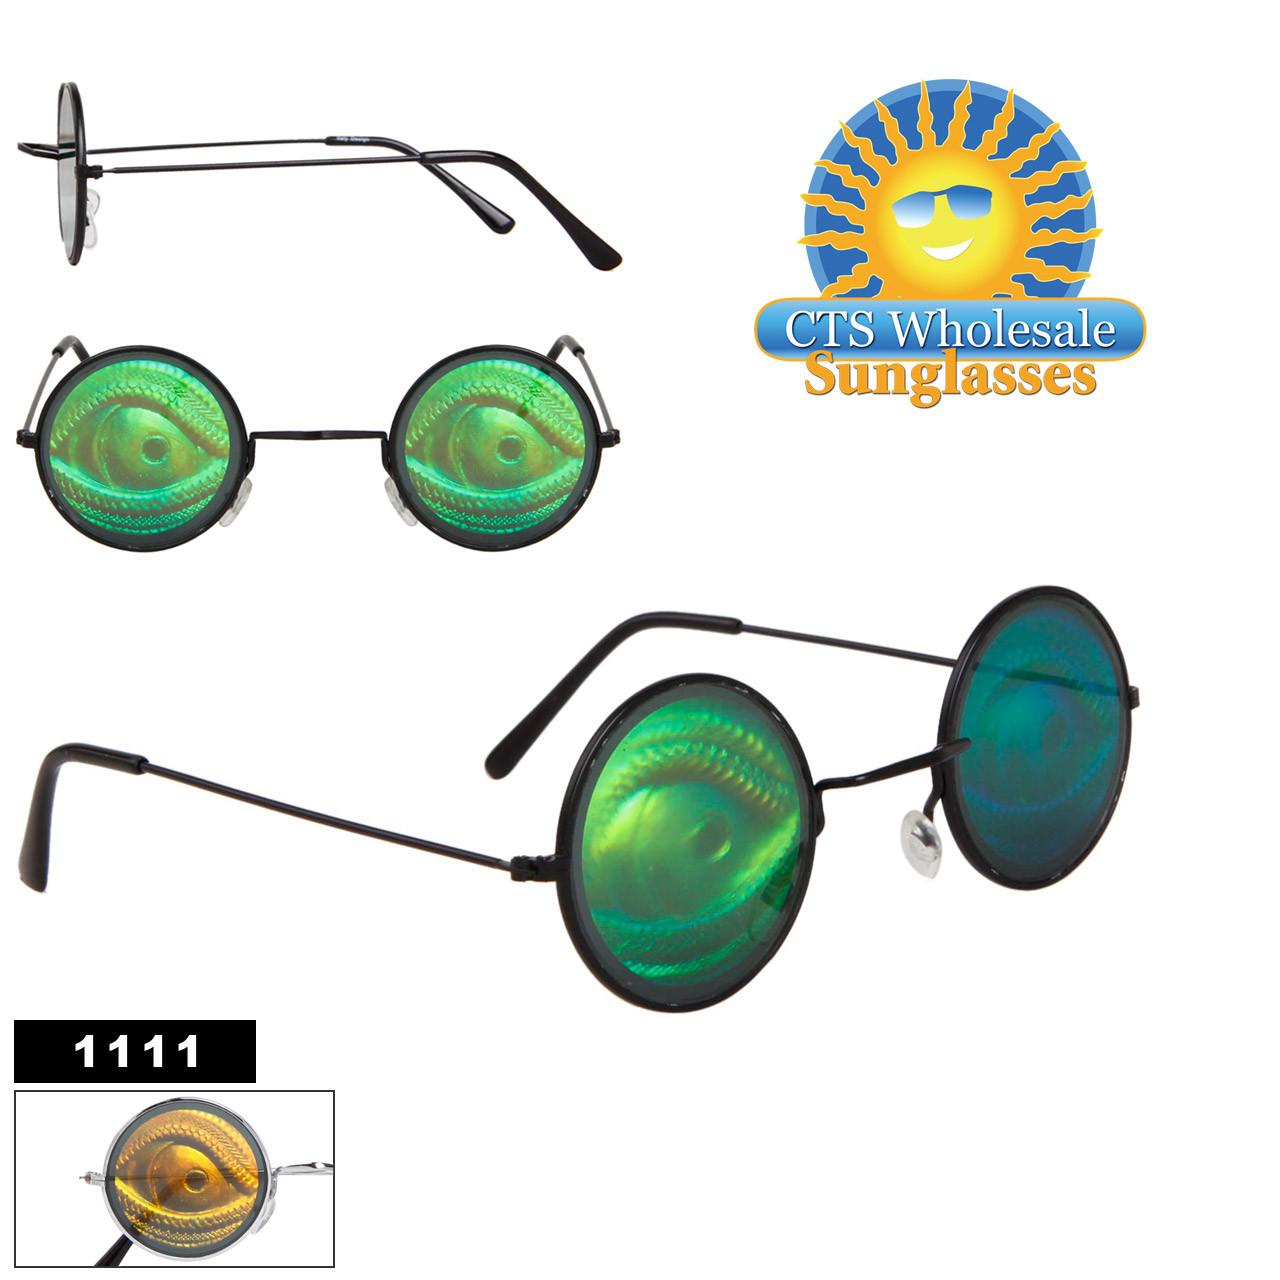 Side Looking Reptile Eyeball Hologram Sunglasses 1111